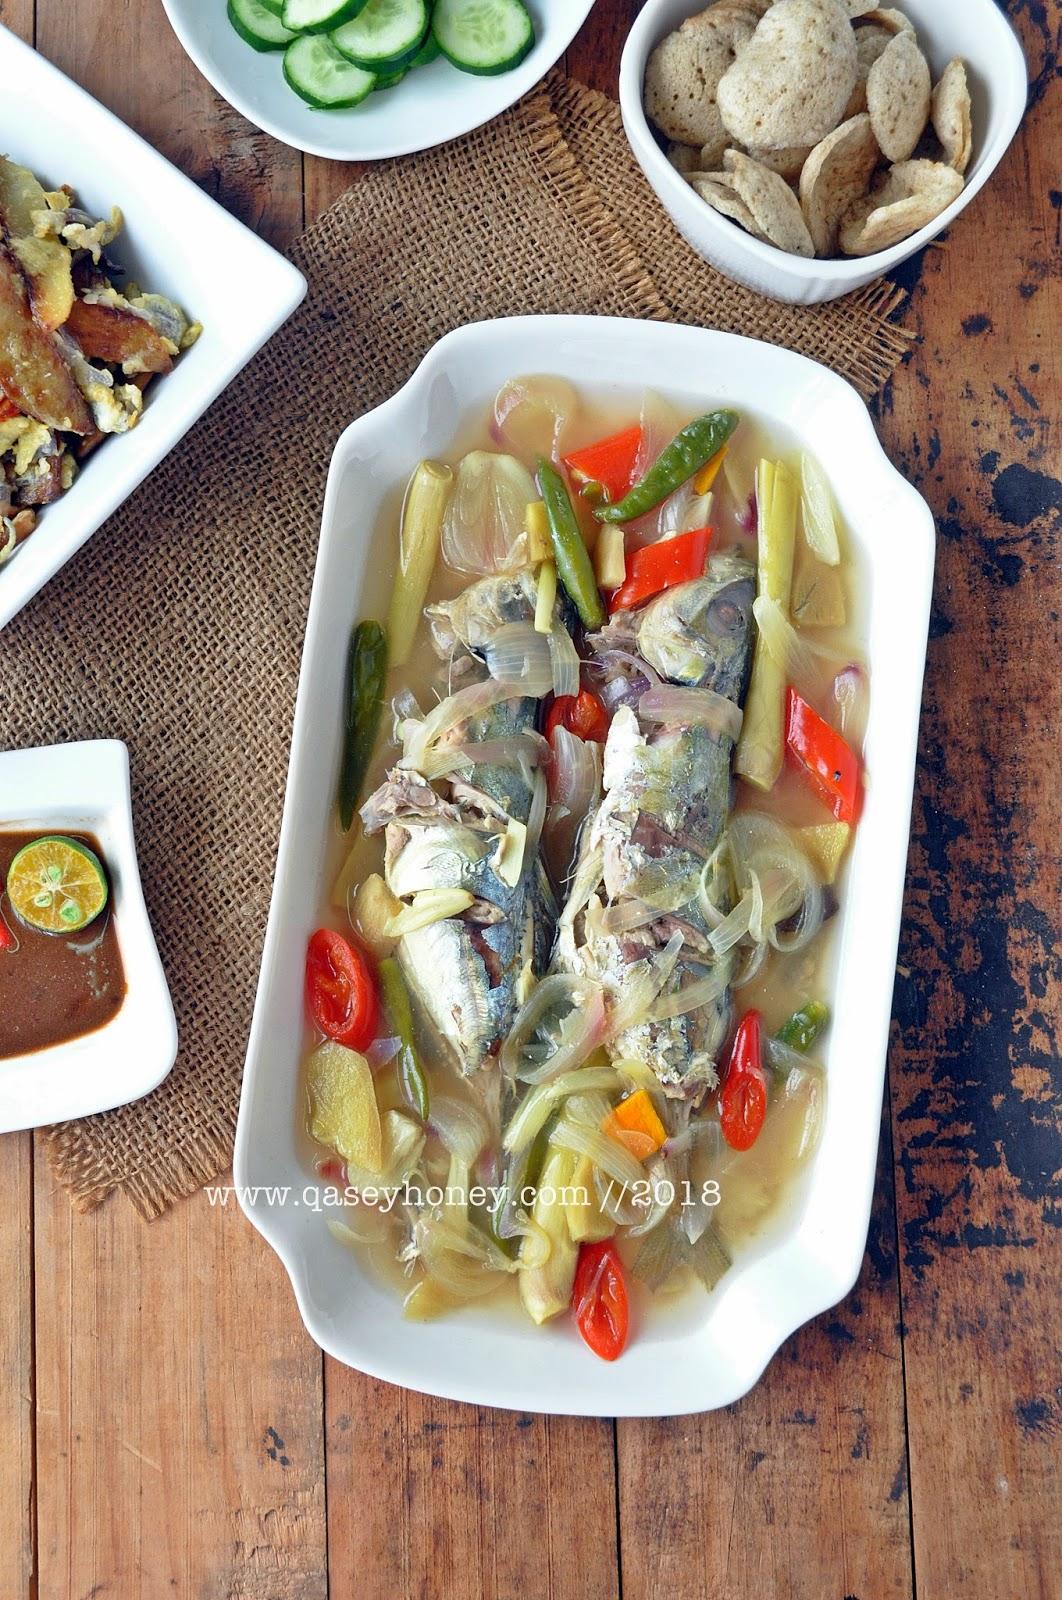 resepi ikan selar masak lemak cili api resep masakan khas Resepi Ikan Selar Kuning Masak Lemak Cili Api Enak dan Mudah